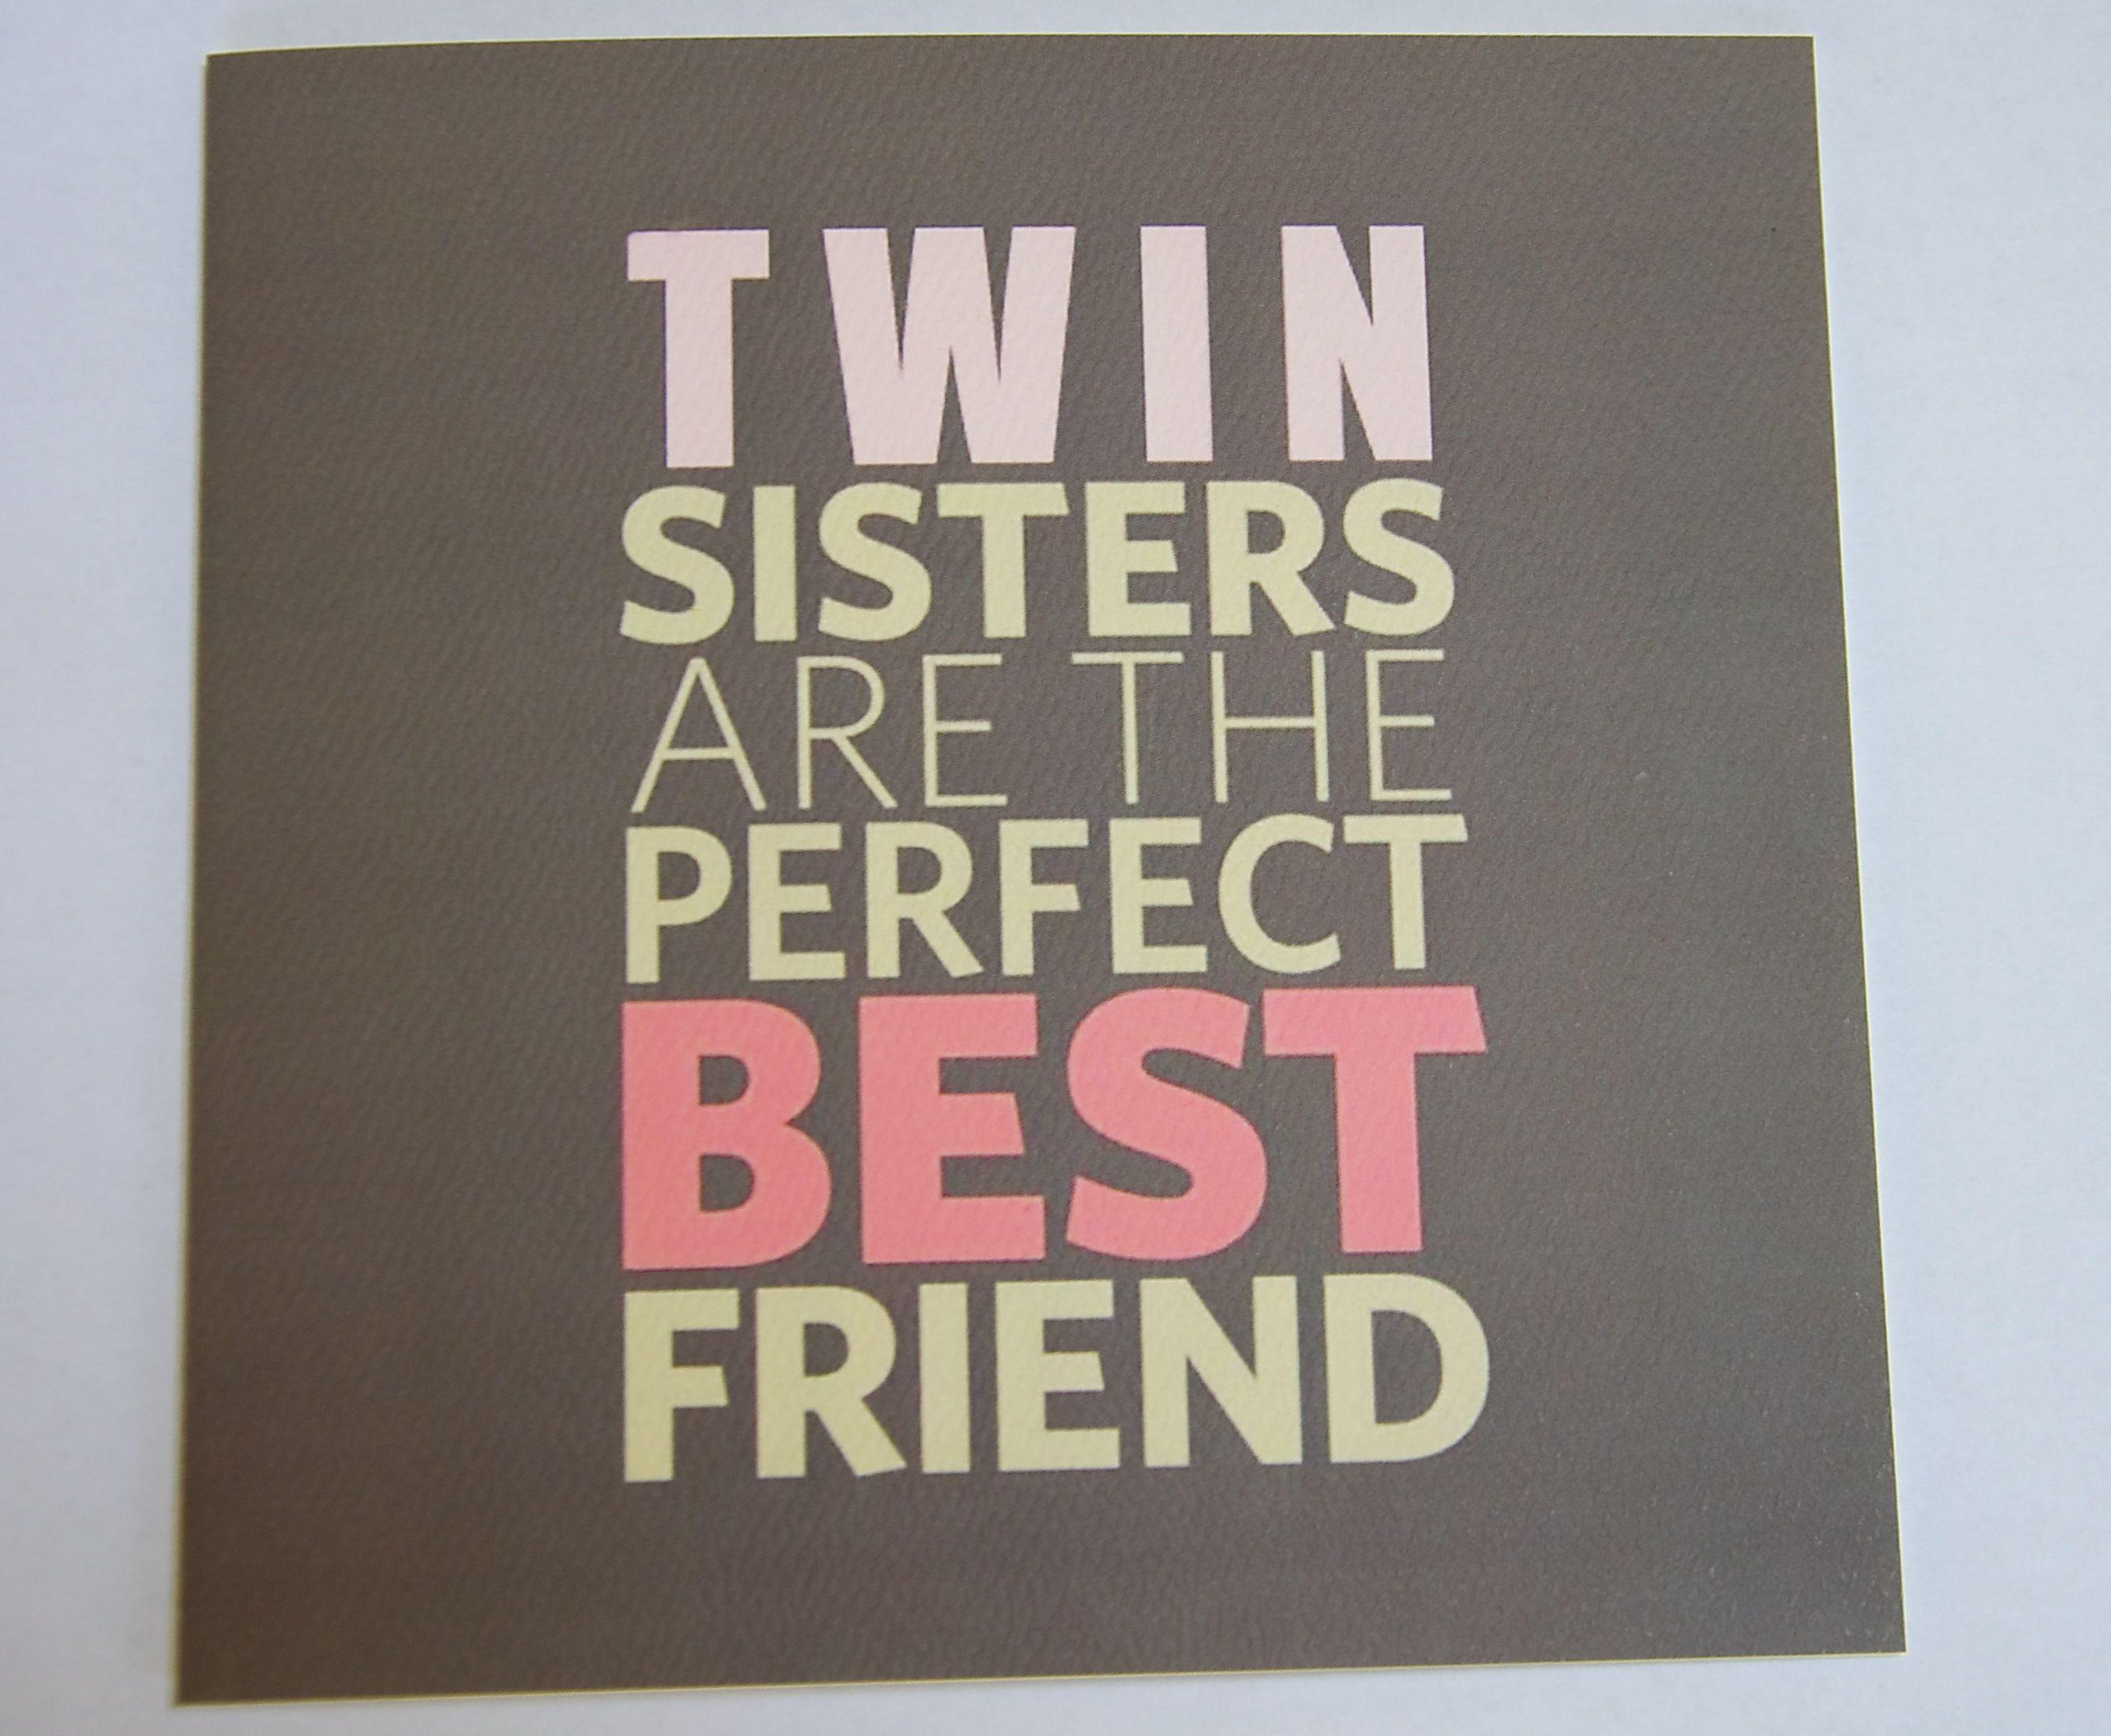 M s de 25 ideas incre bles sobre hermanas gemelas en for Cuartos para ninas tumbler